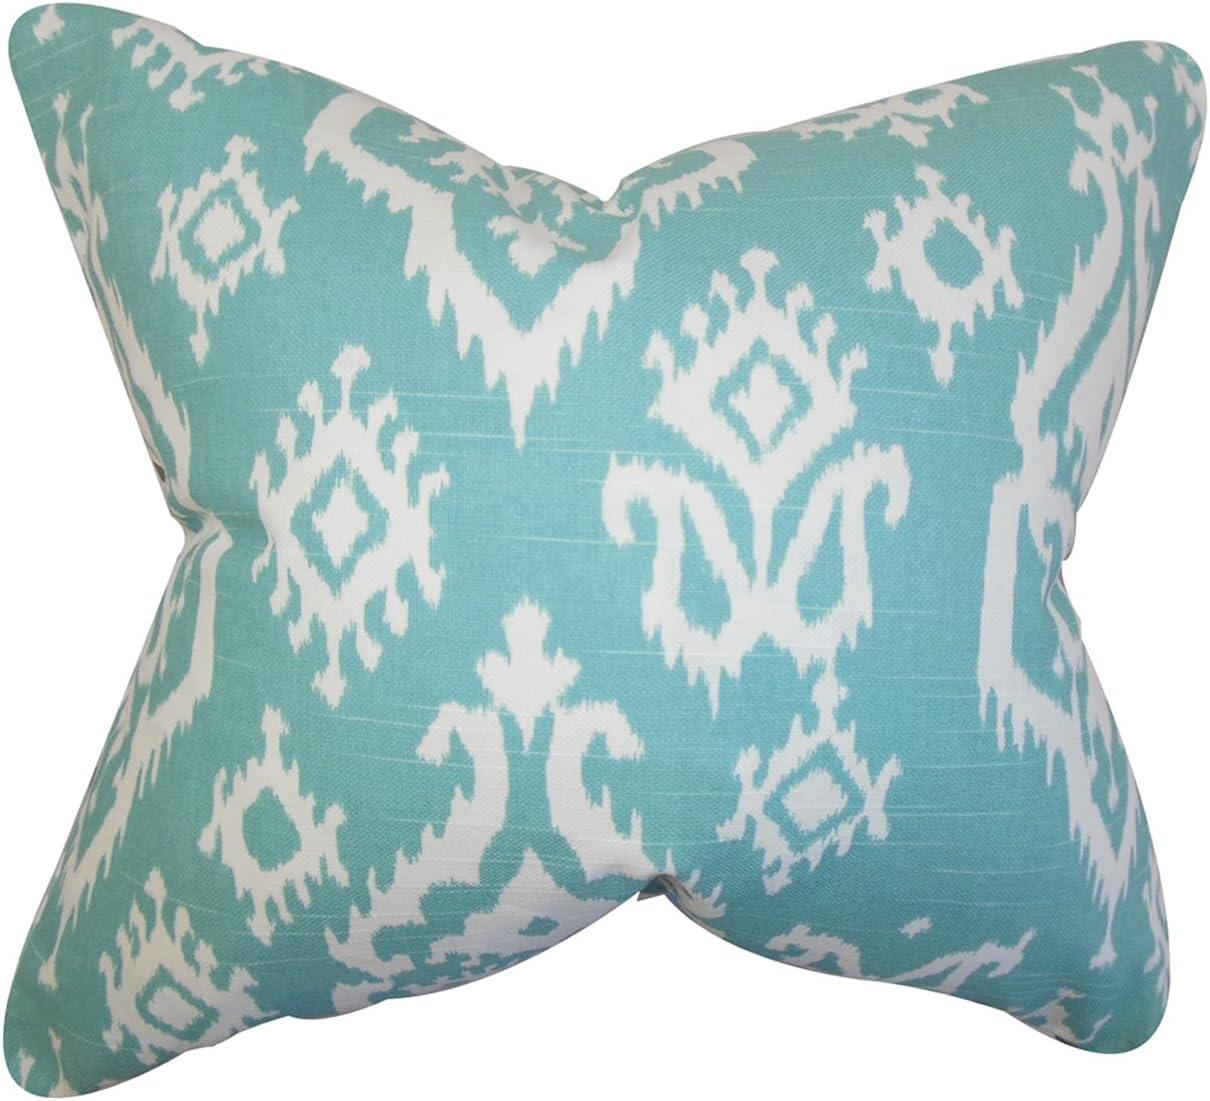 The Pillow Collection Baraka Ikat Bedding Sham Blue King//20 x 36